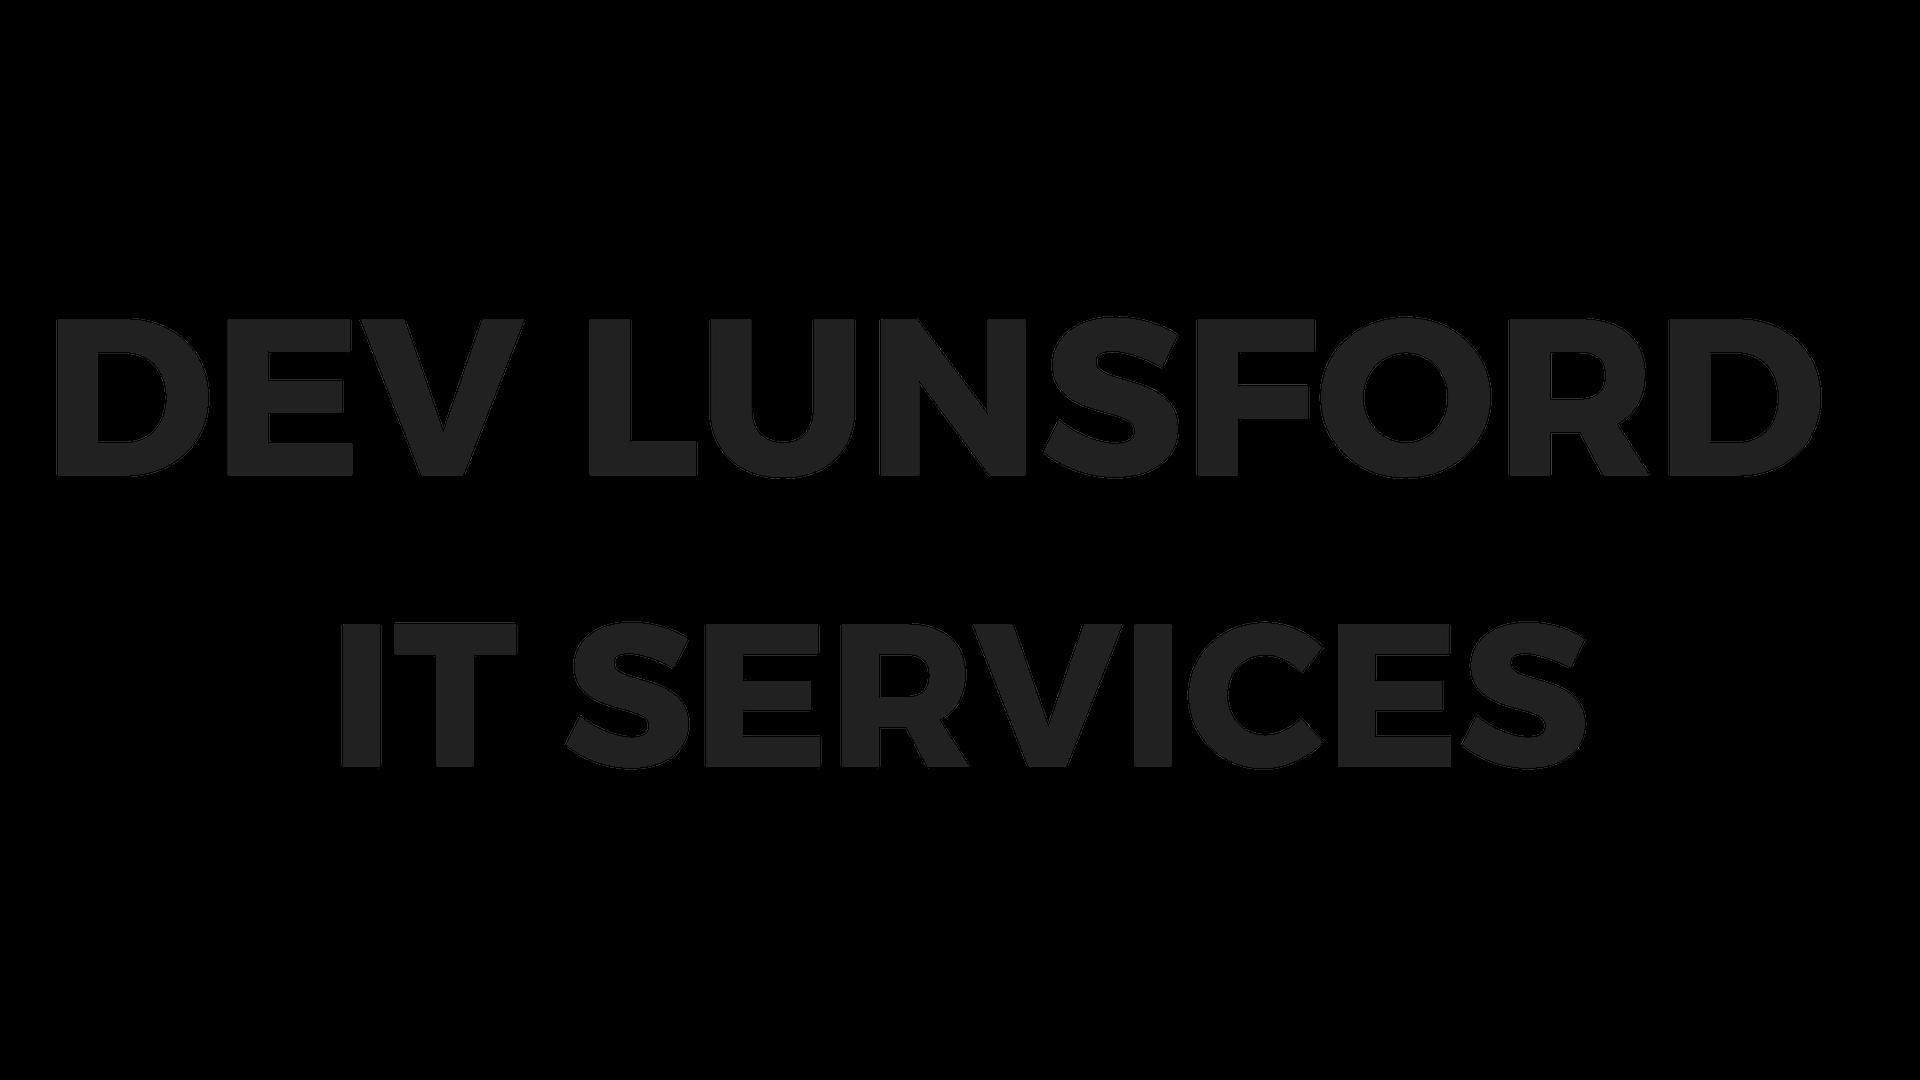 Dev Lunsford